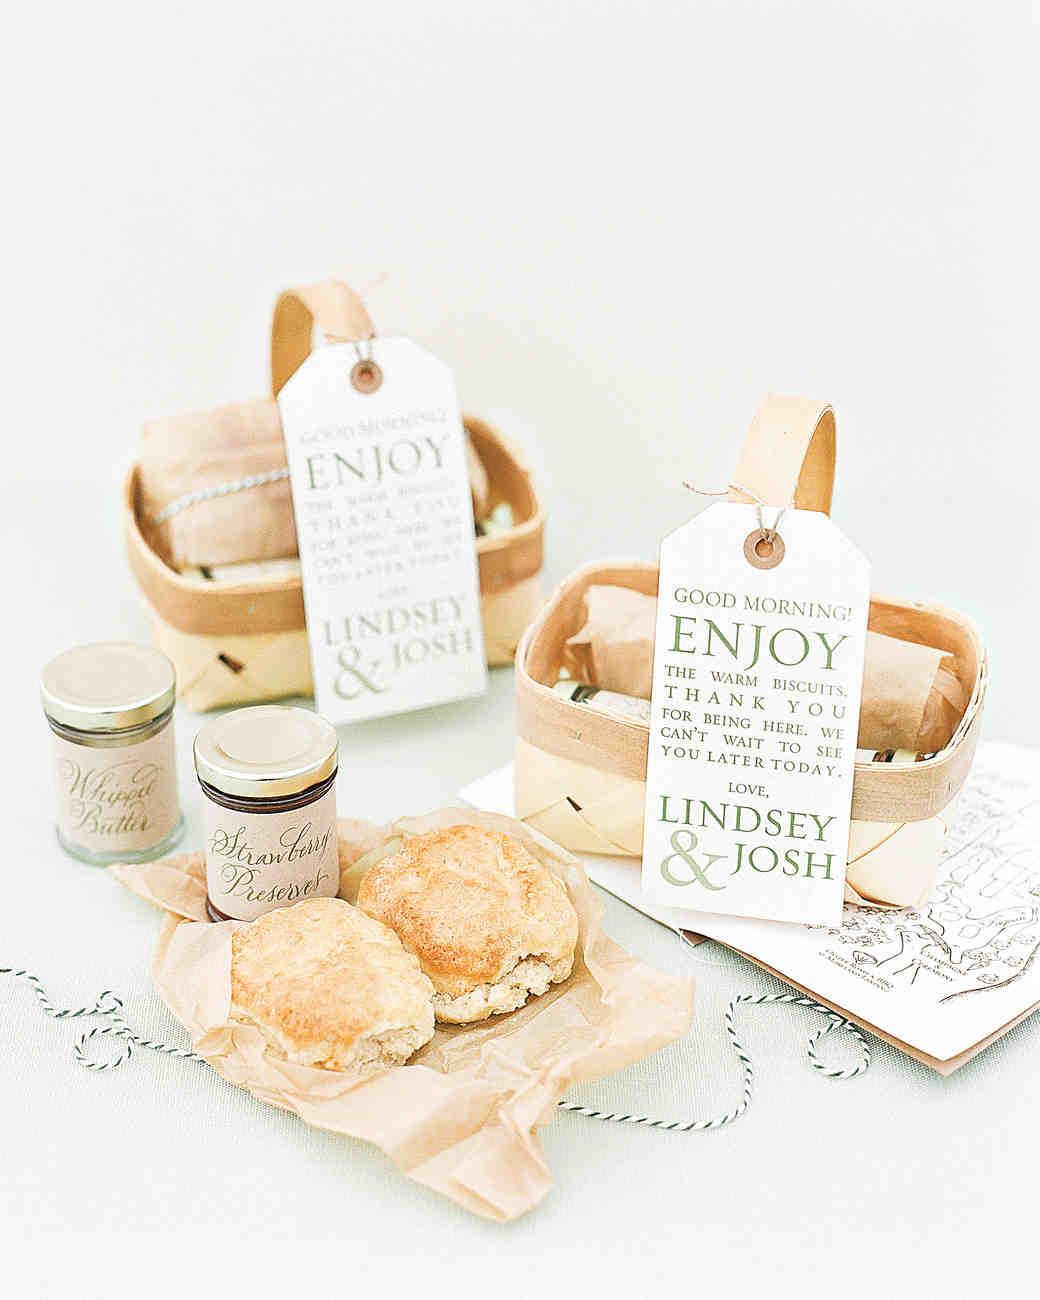 biscuits-jam-breakfast-basket-2013-lindsey-josh-0273-mwds110860.jpg